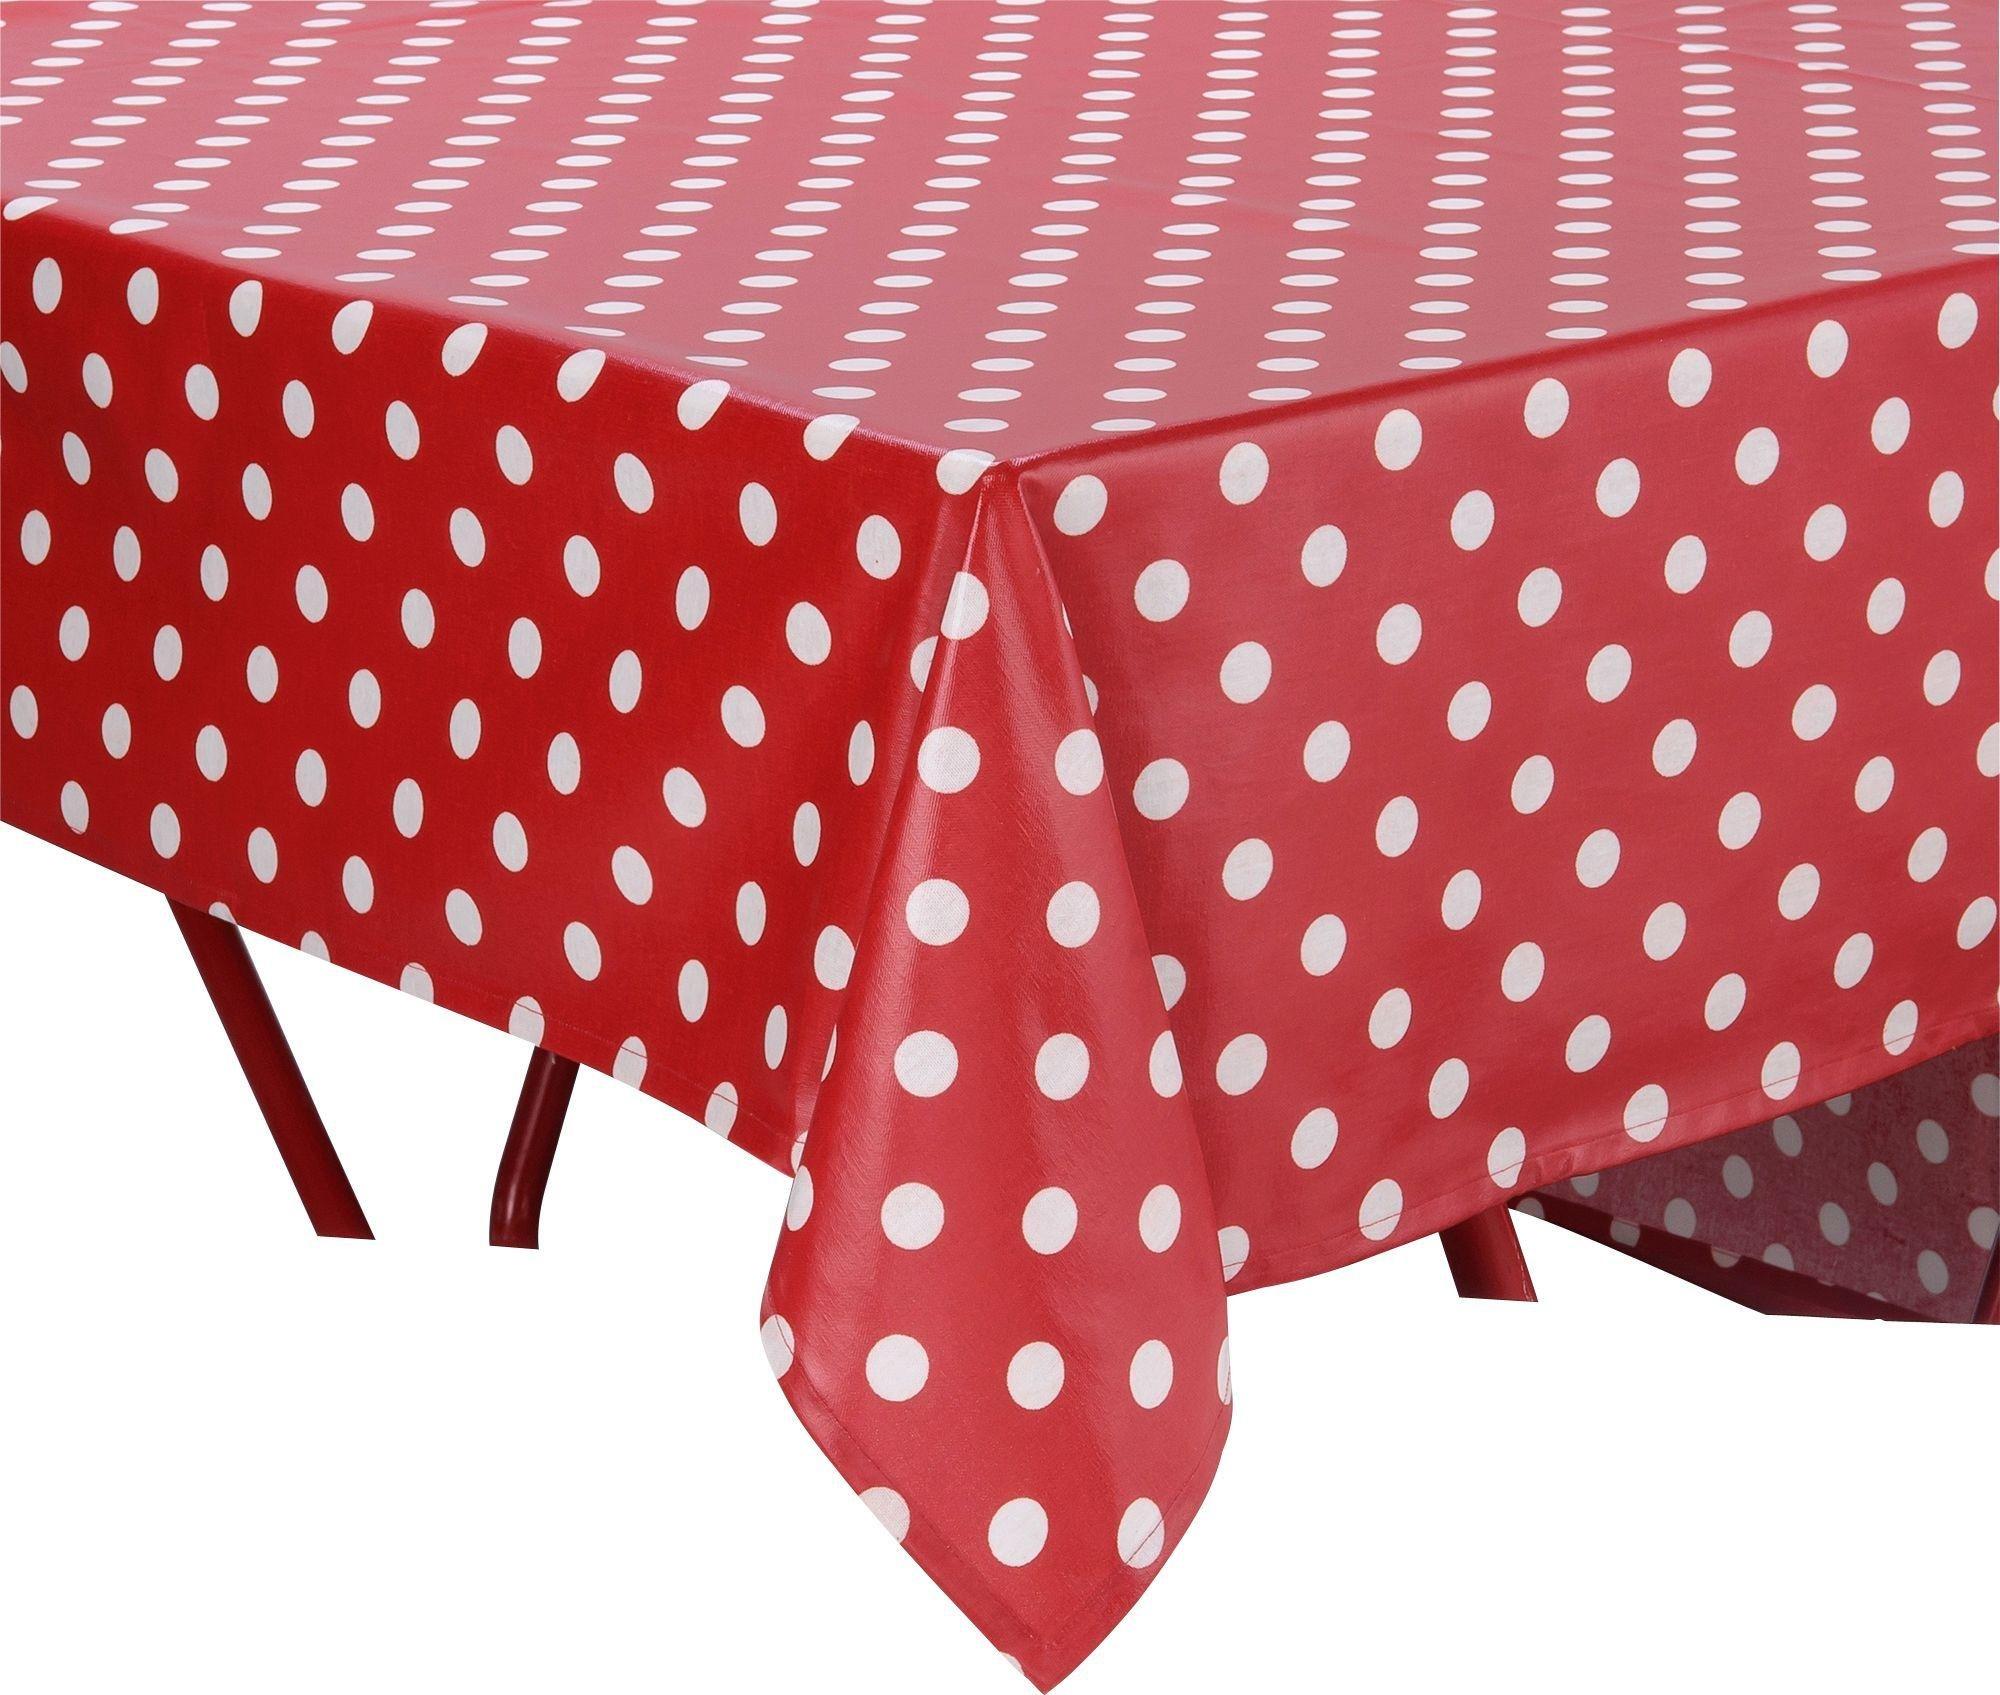 Polka dot tablecloth pink and white polka dot tablecloth for Black polka dot tablecloth